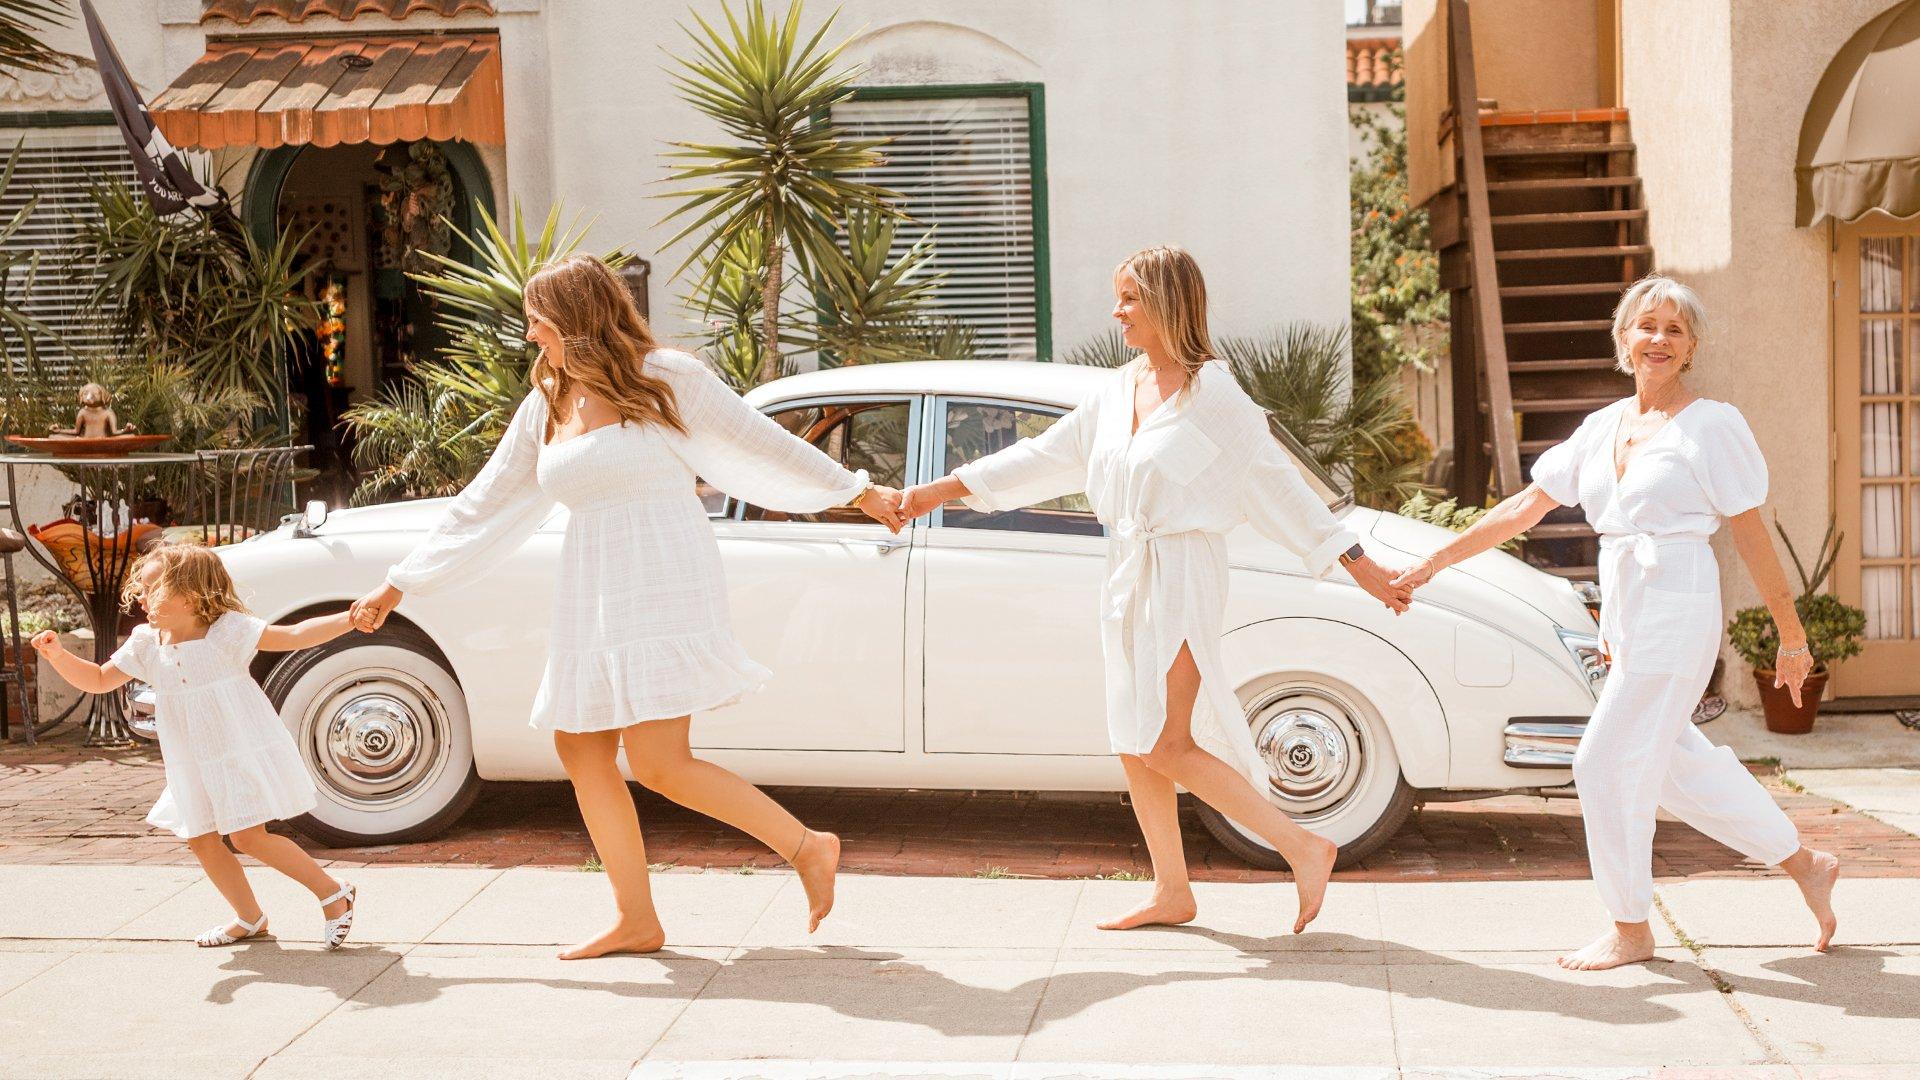 women running together